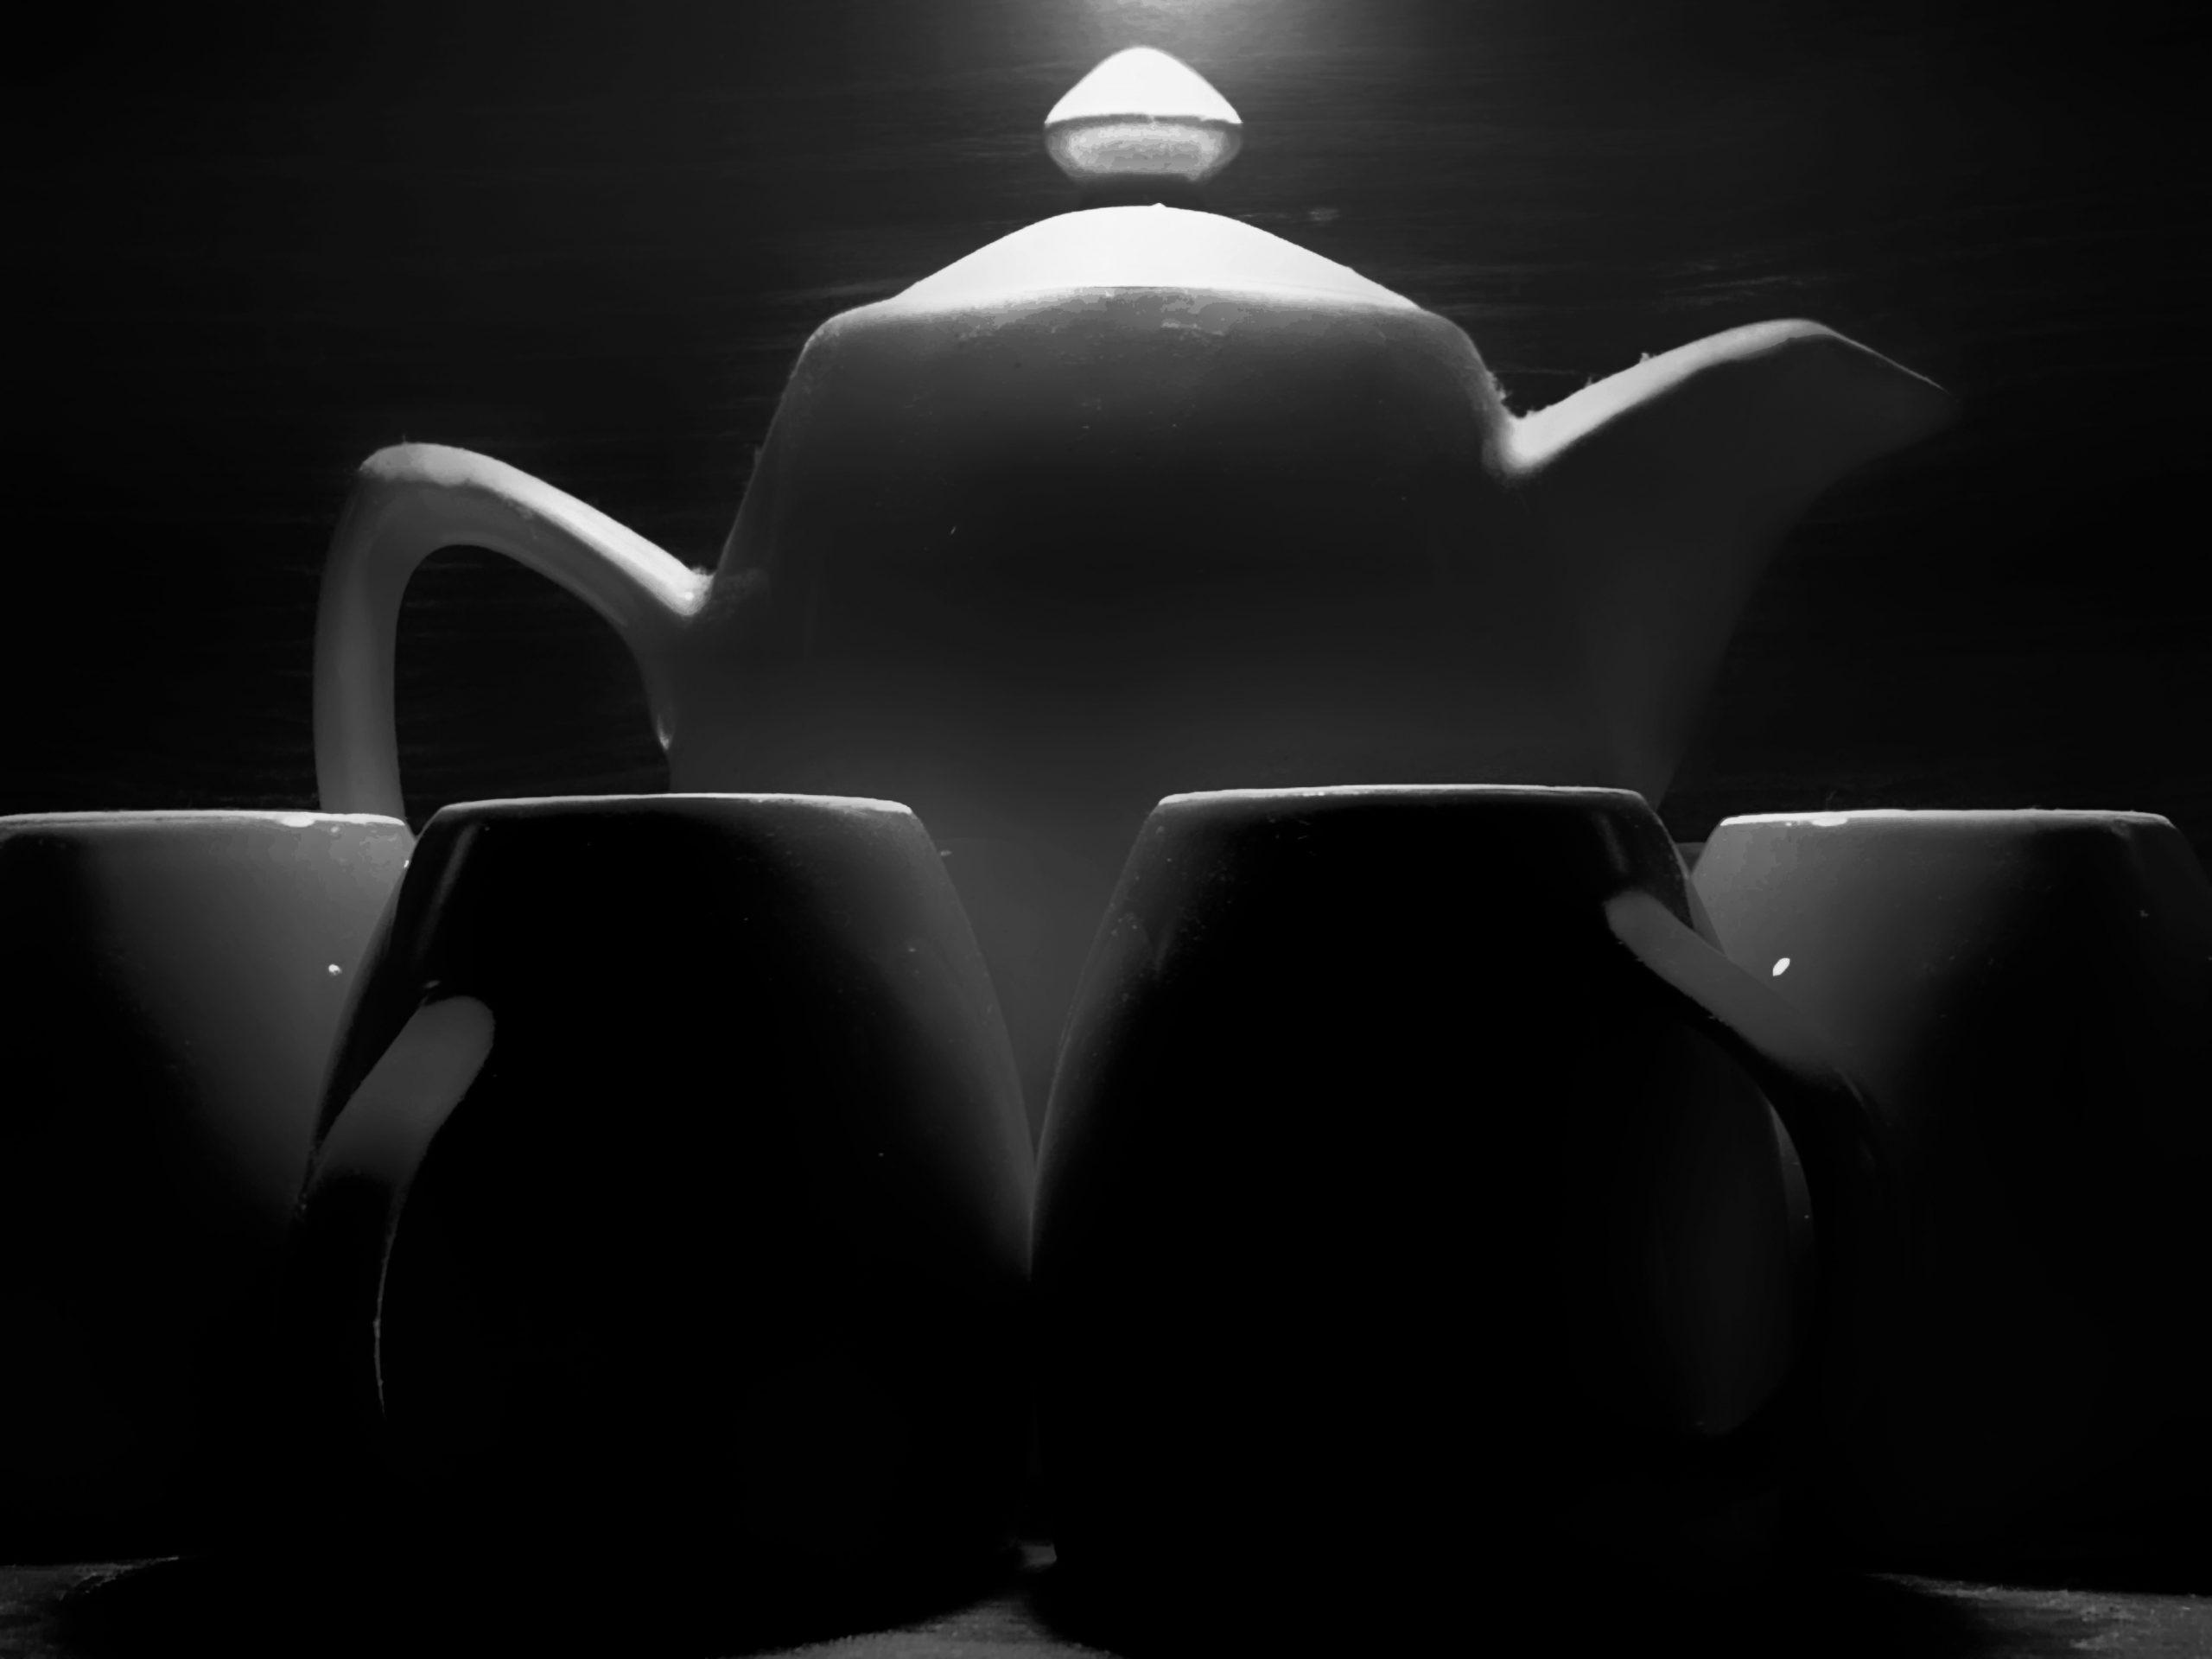 Black and white kitchen ware